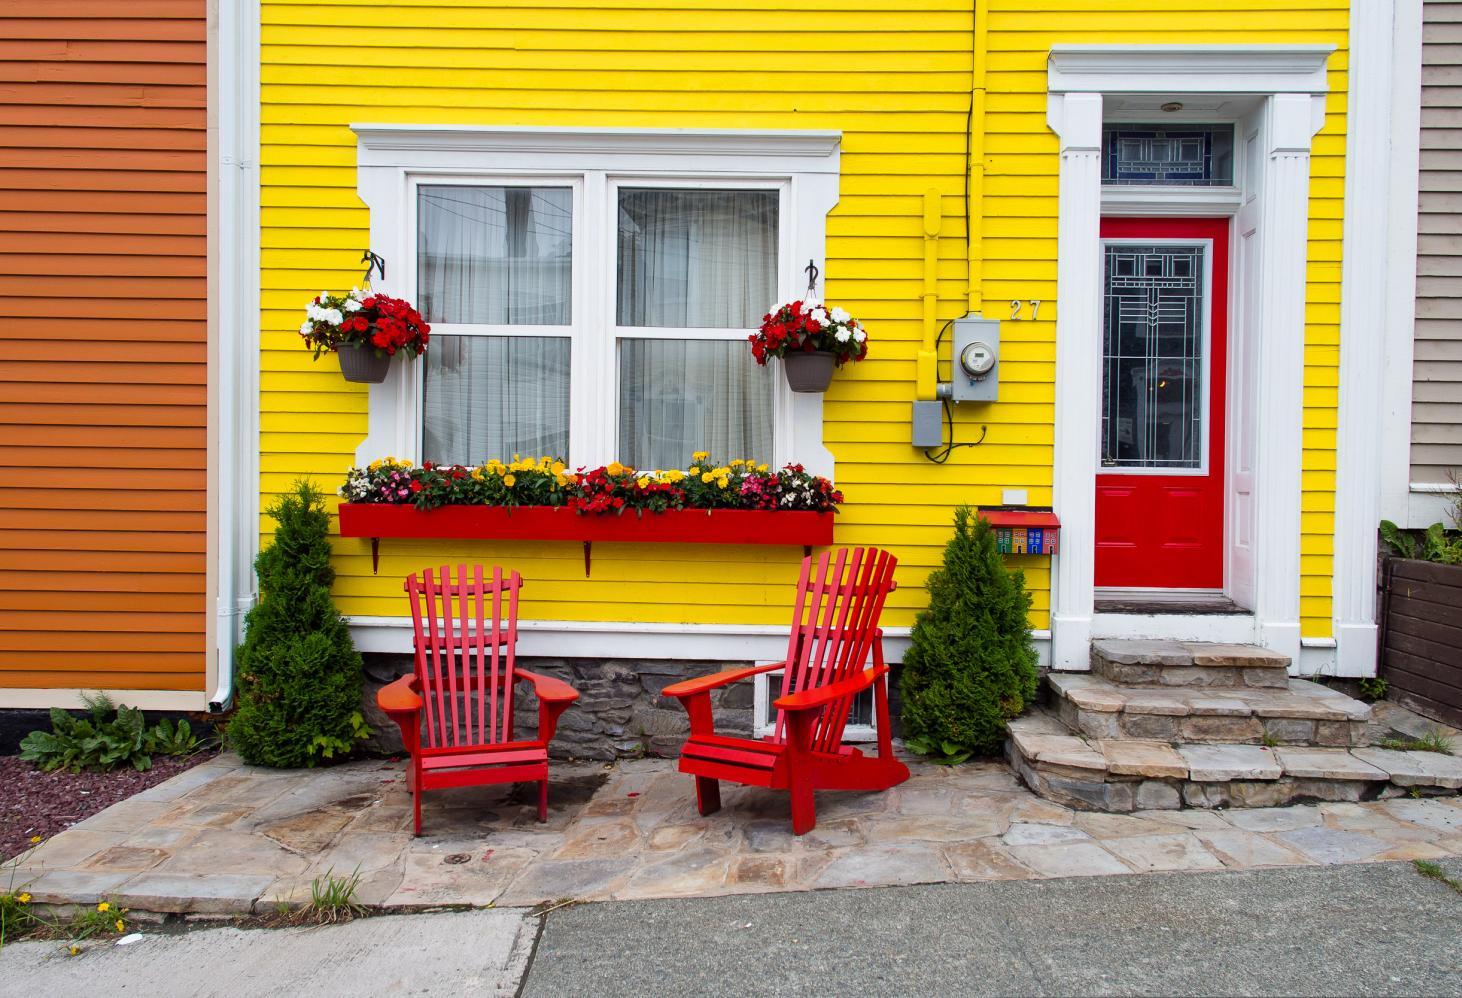 Конфетная улица, Сент-Джонс (Канада)